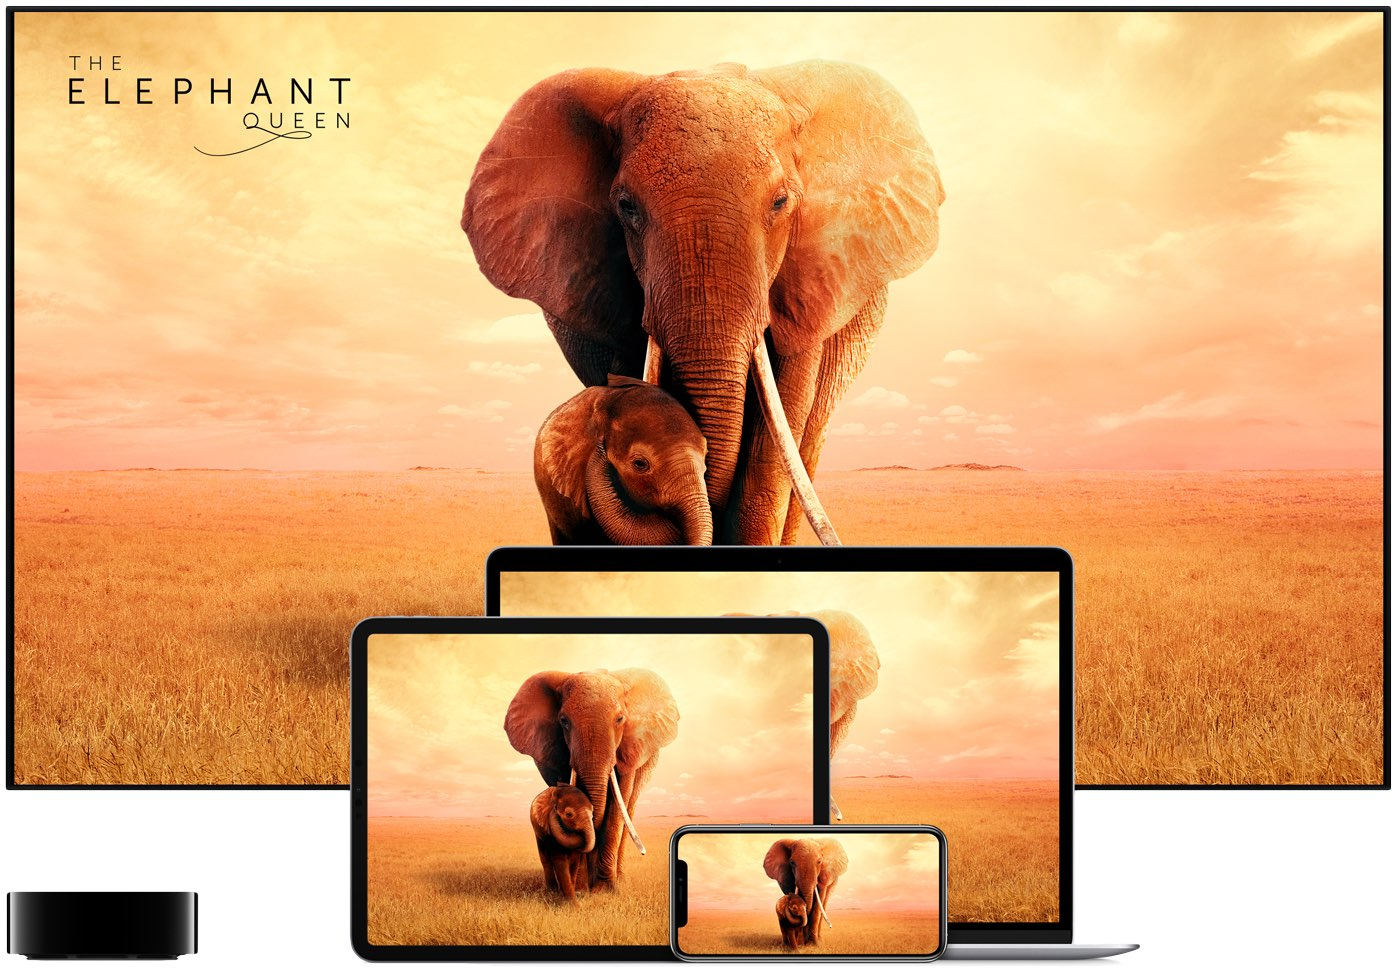 Free Apple TV+ trial